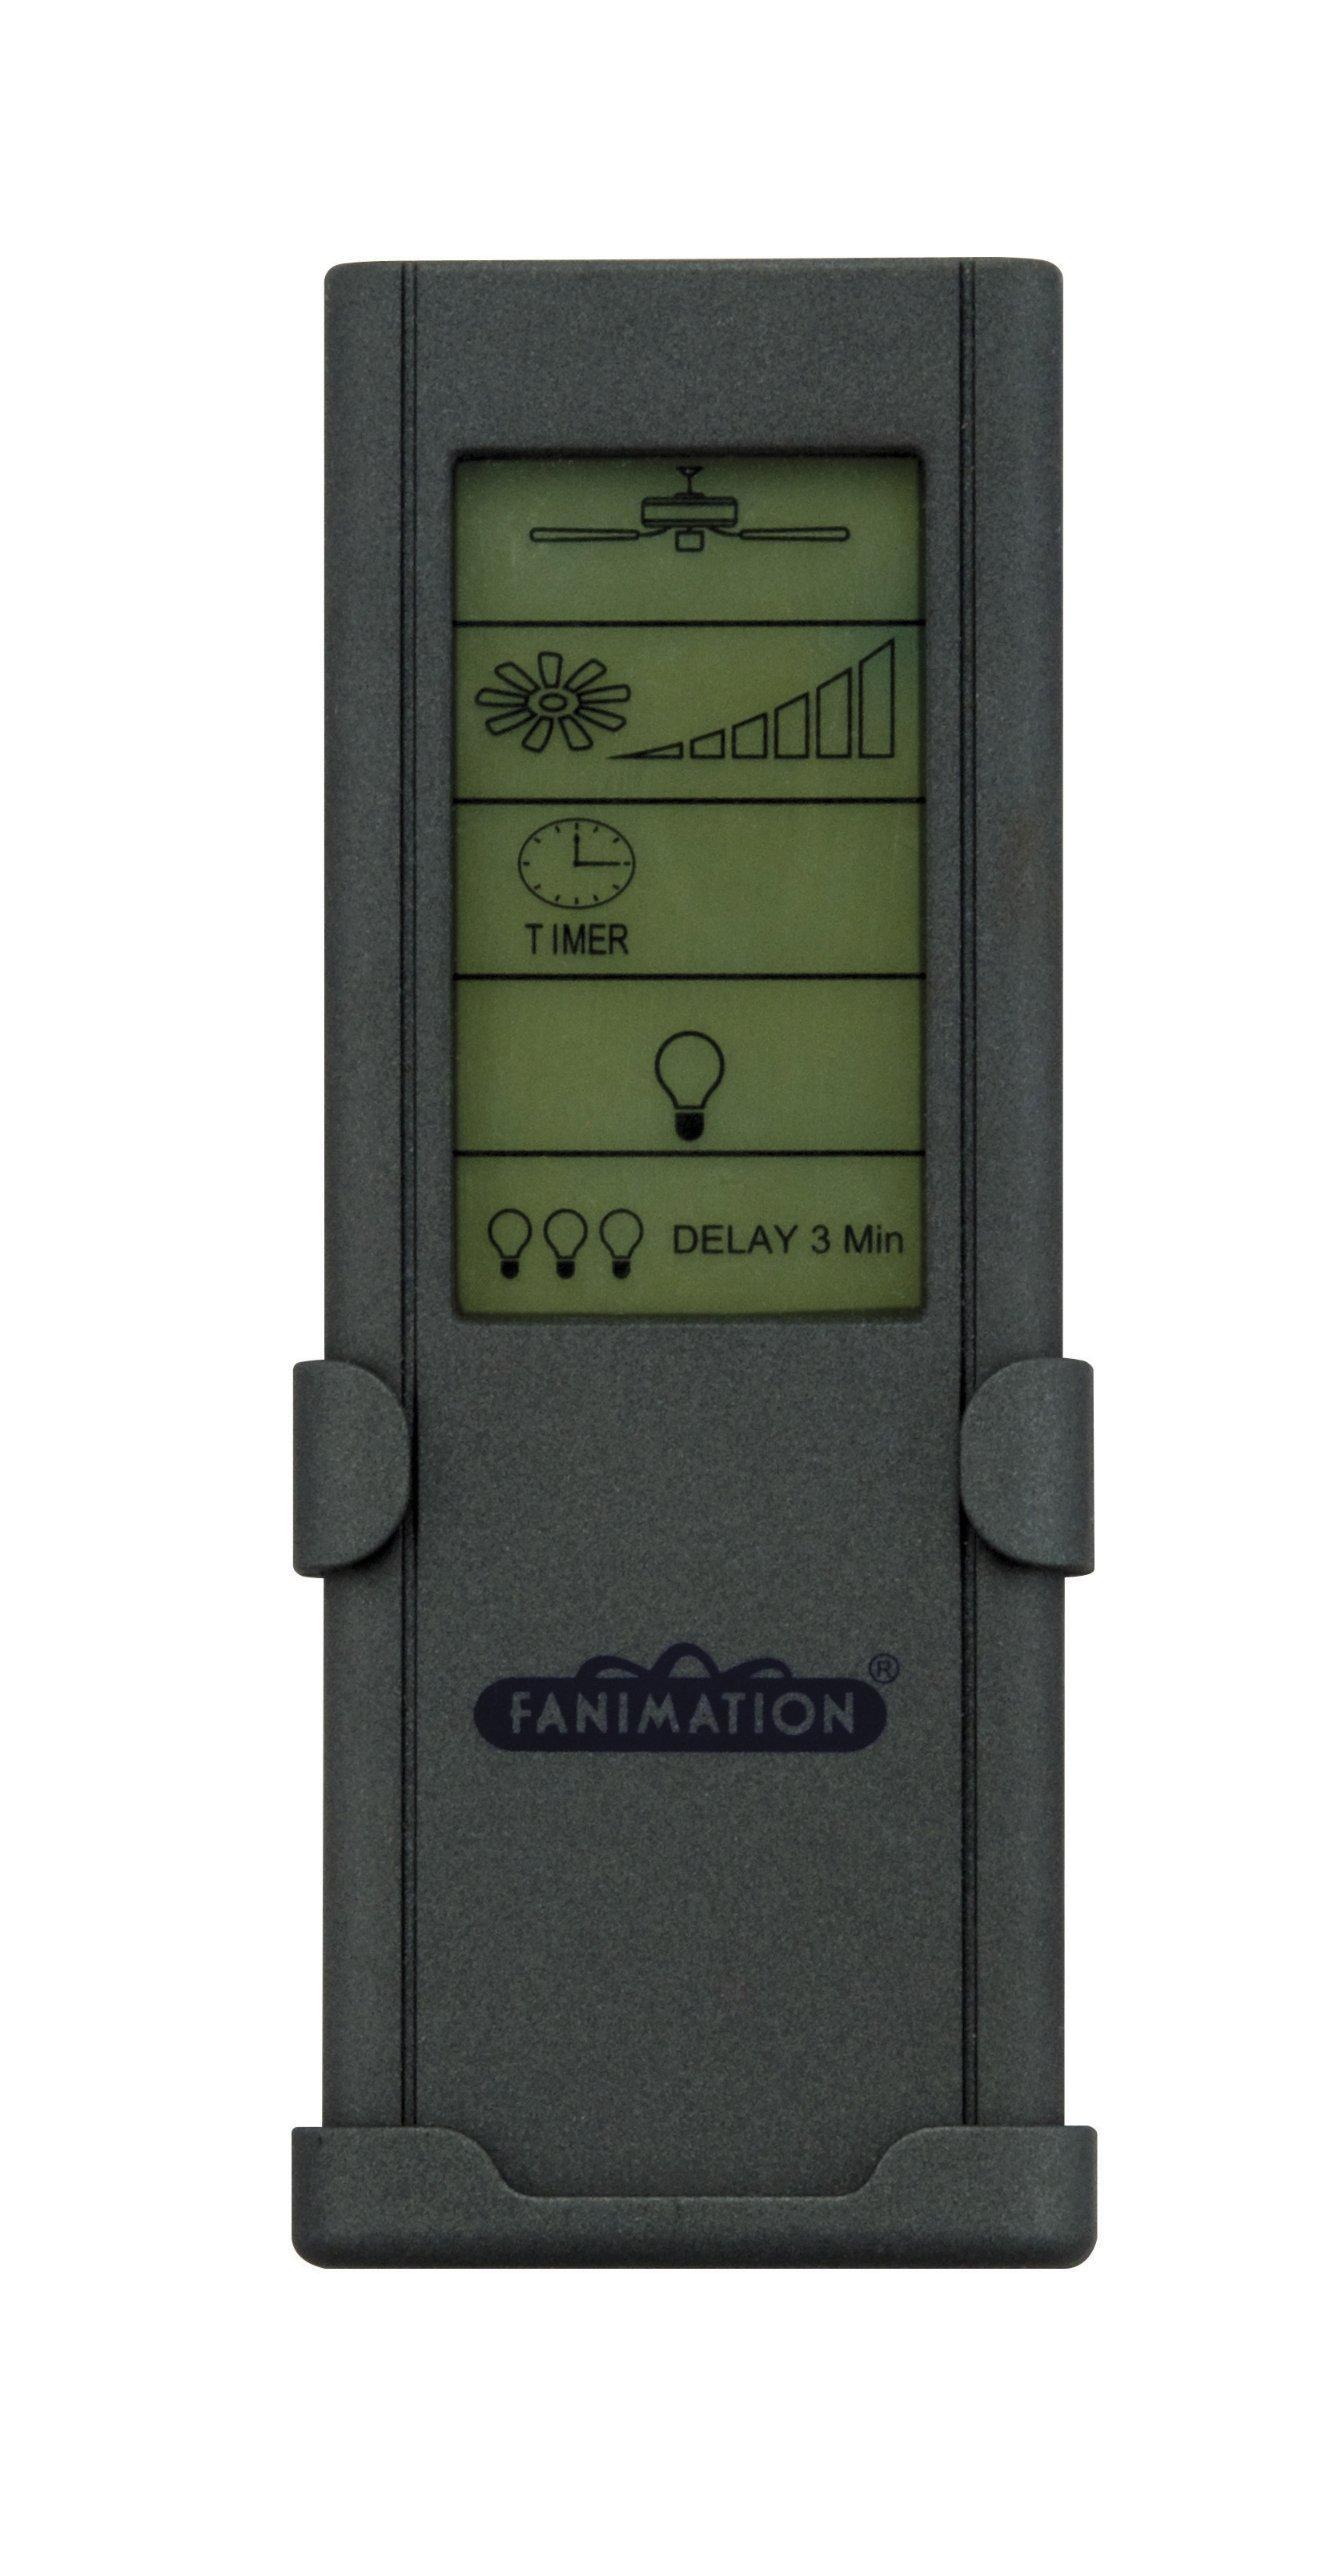 Fanimation CRL8TS Touch Screen Ceiling Fan Remote, 3-Speed/Non Reversing